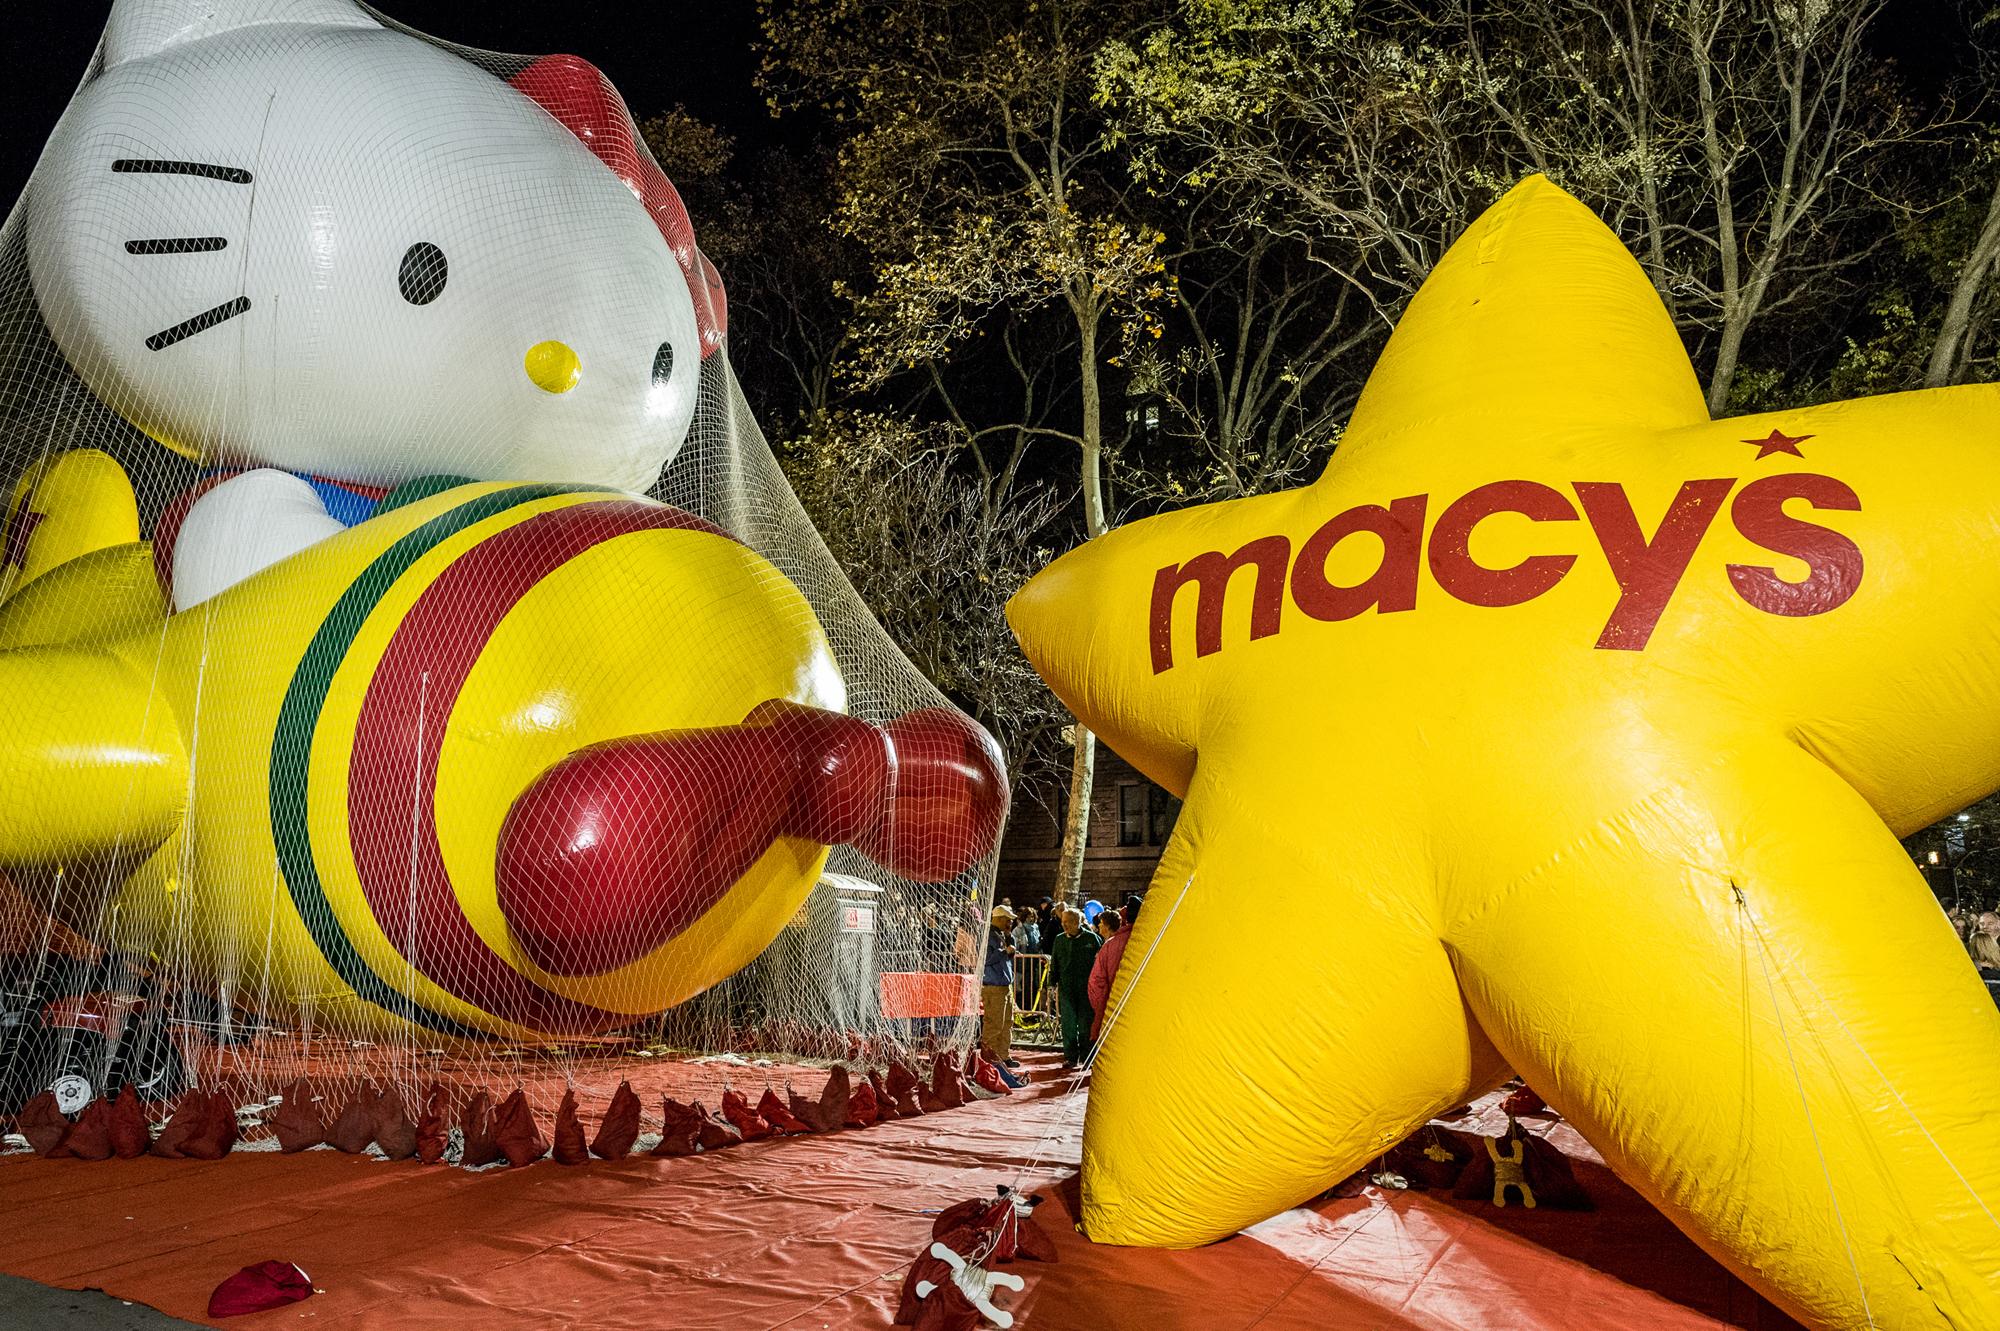 Macy's Parade Balloon Inflation, November 2012